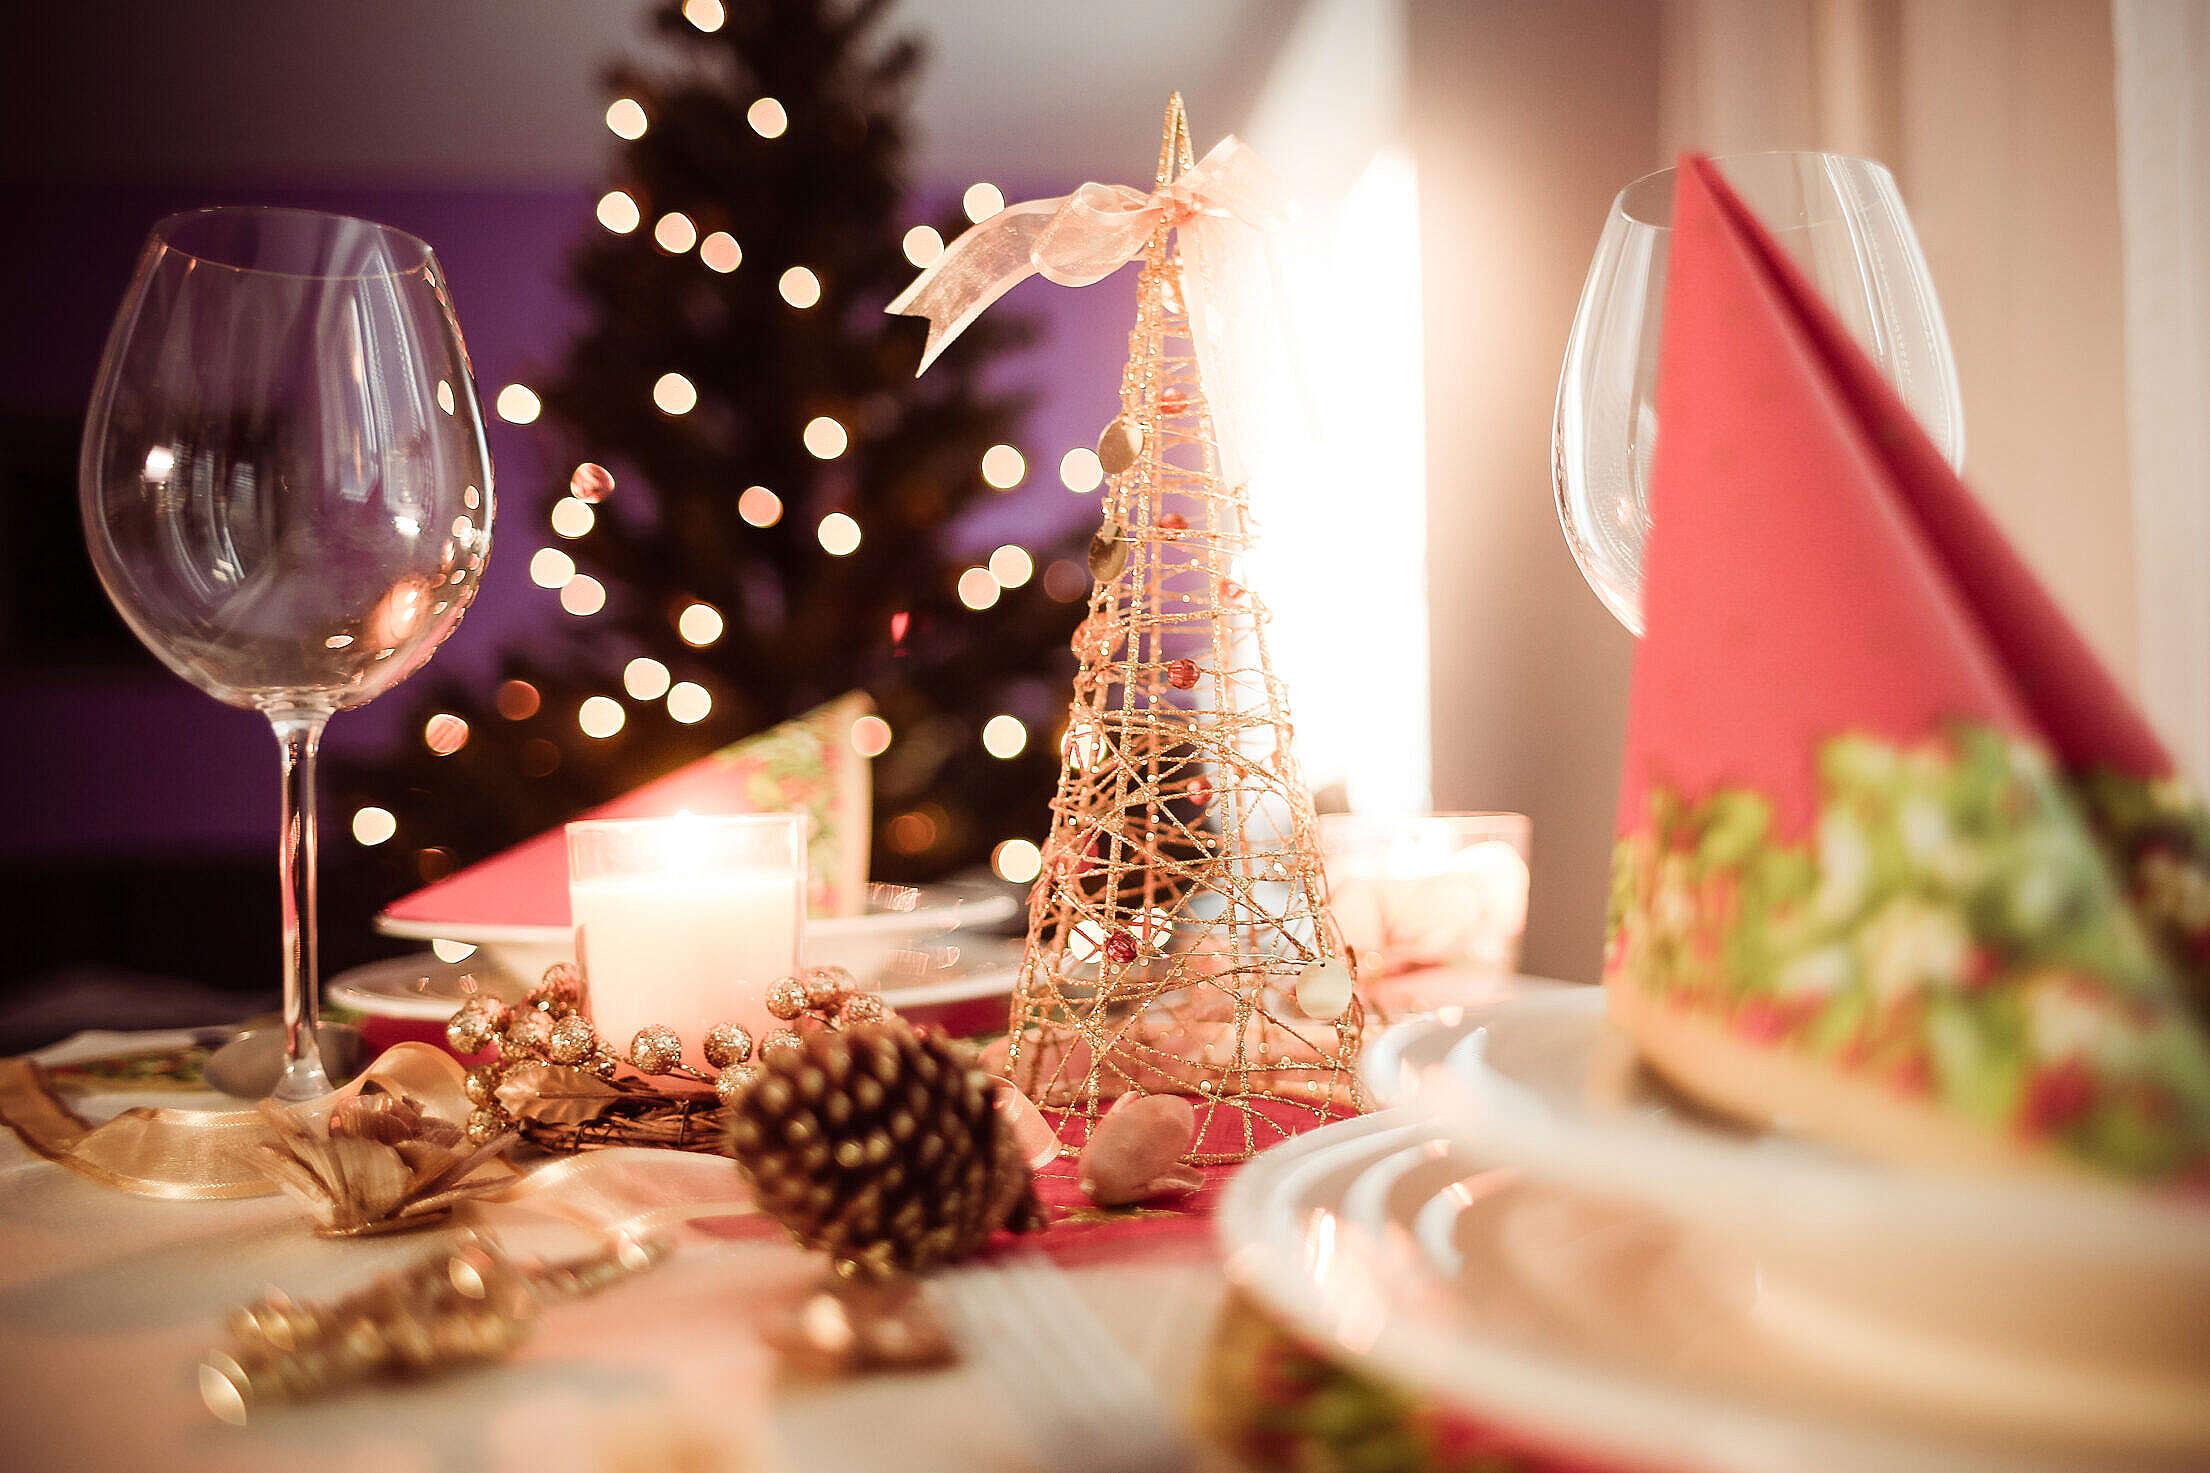 Soft Christmas Table Setting Free Stock Photo